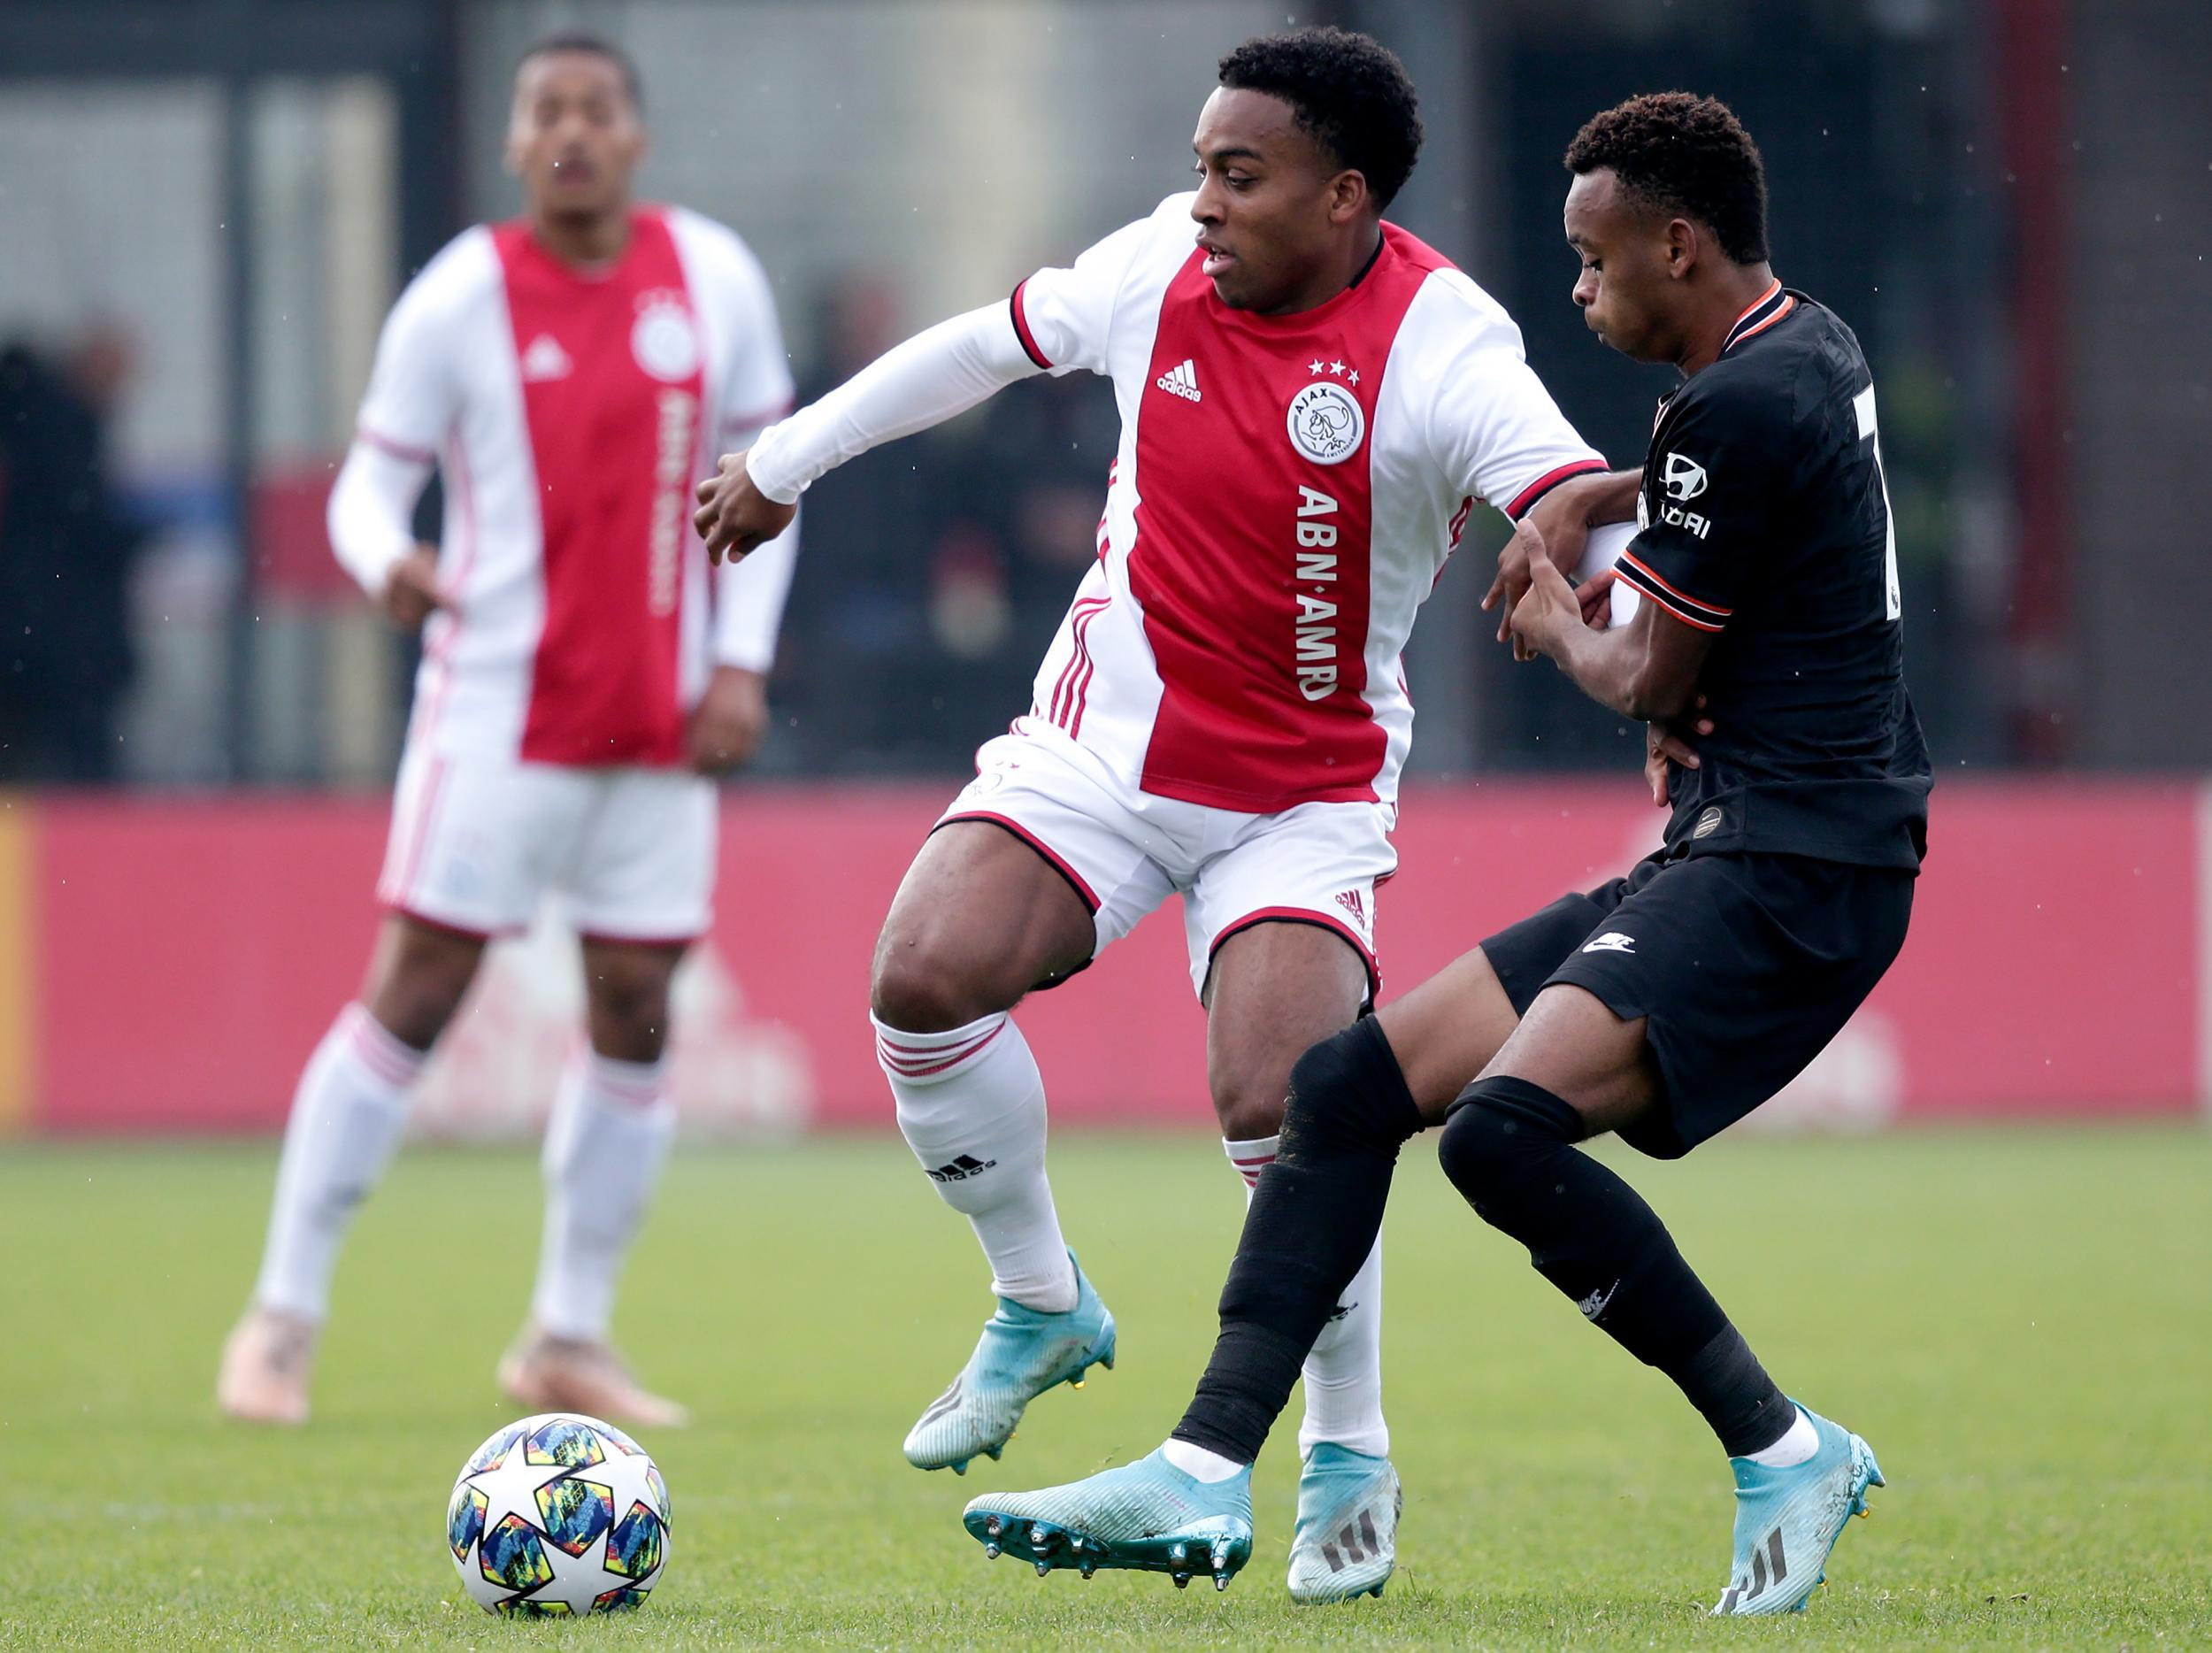 Ajax Vs Chelsea Live Stream Team News And Latest Updates